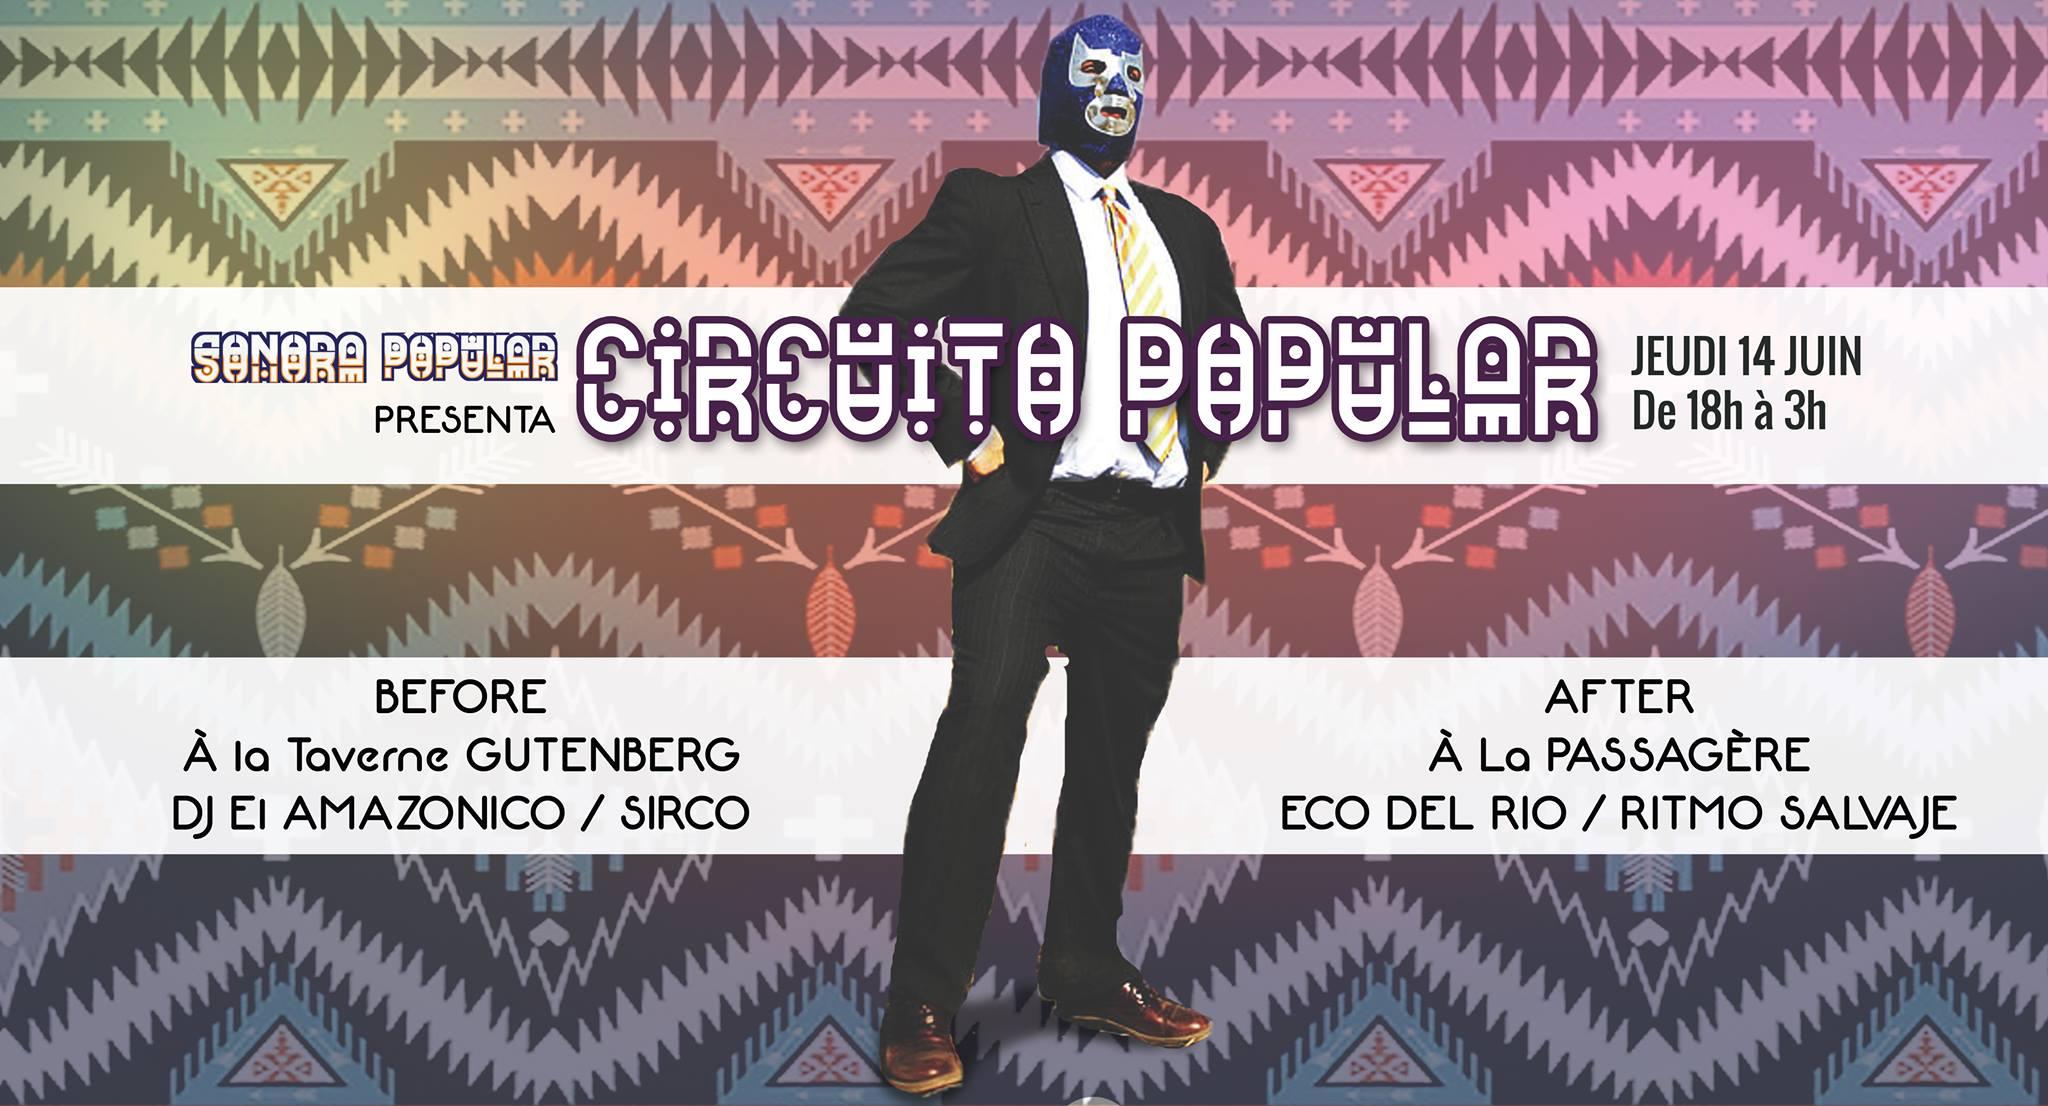 Circuito Popular, 14 juin 2018